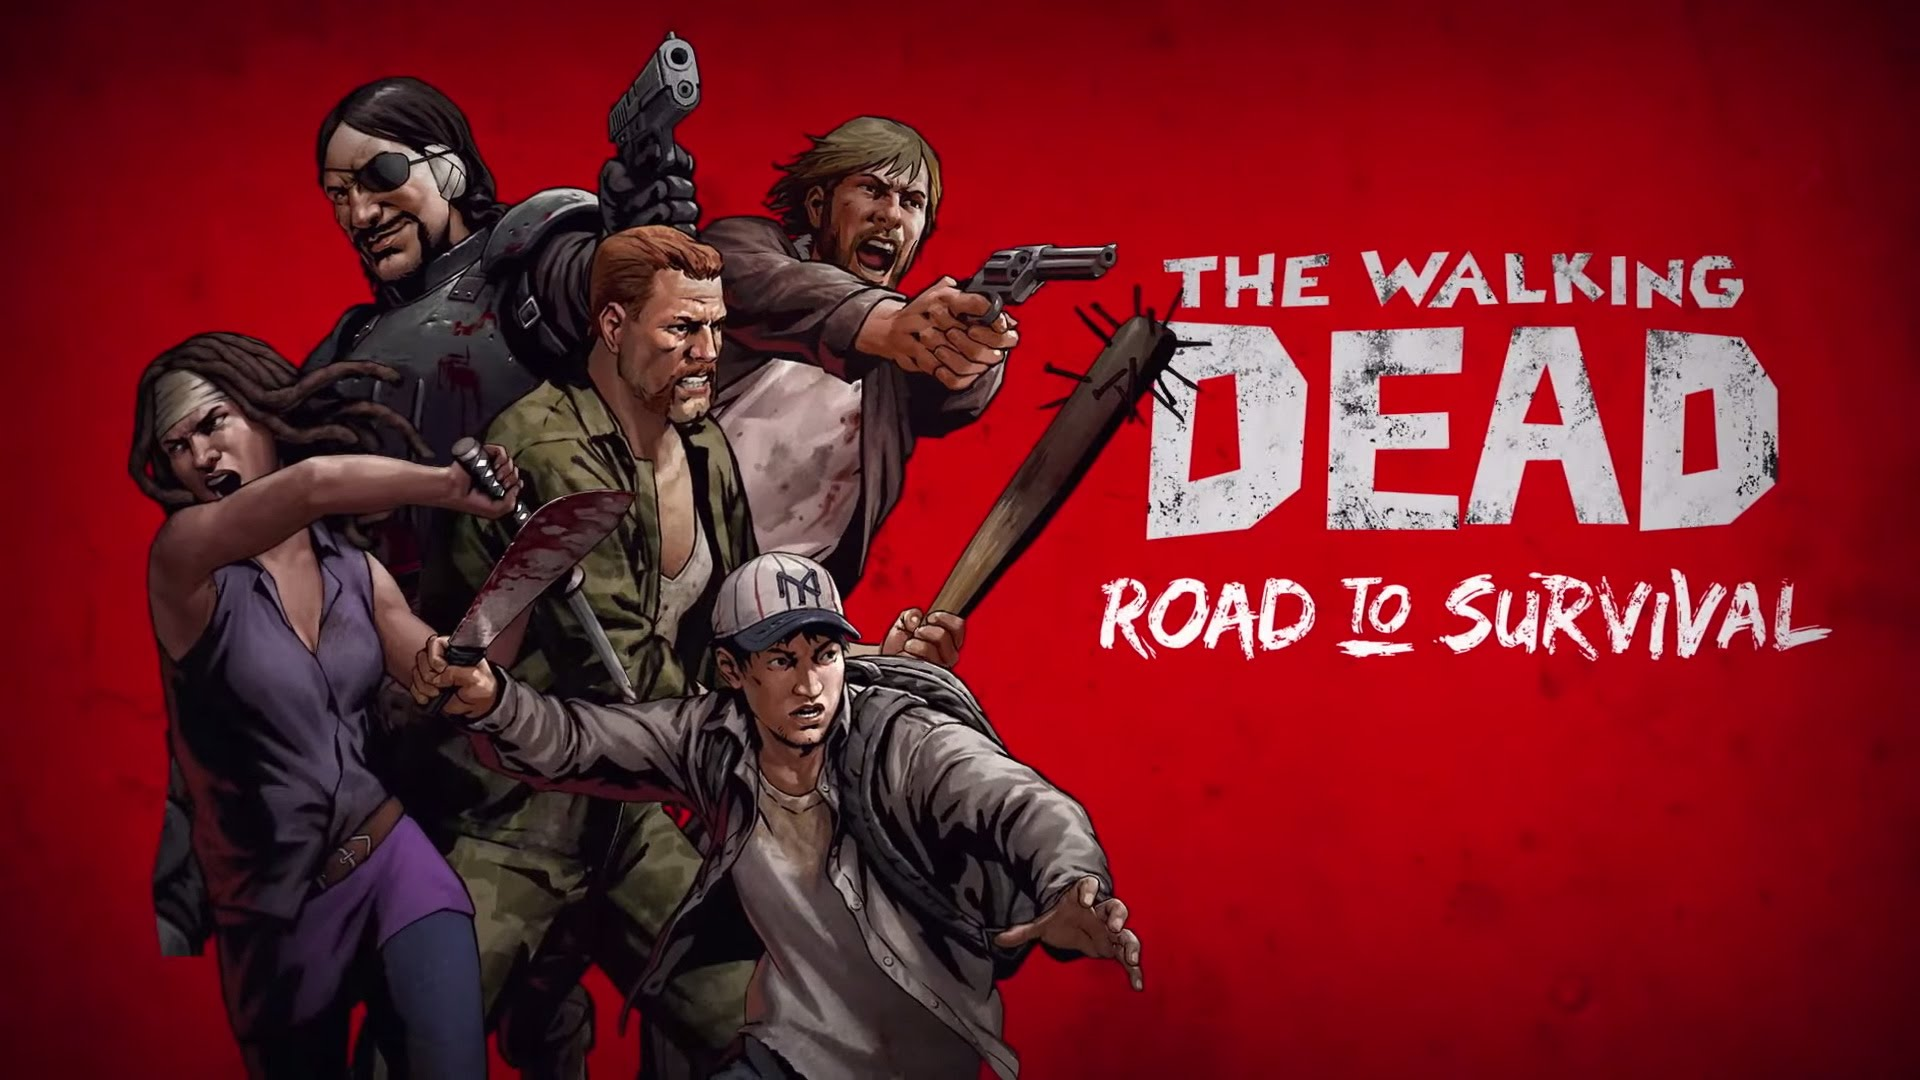 WALKING DEAD: ROAD TO SURVIVAL (2017)  Scopely Los Angeles